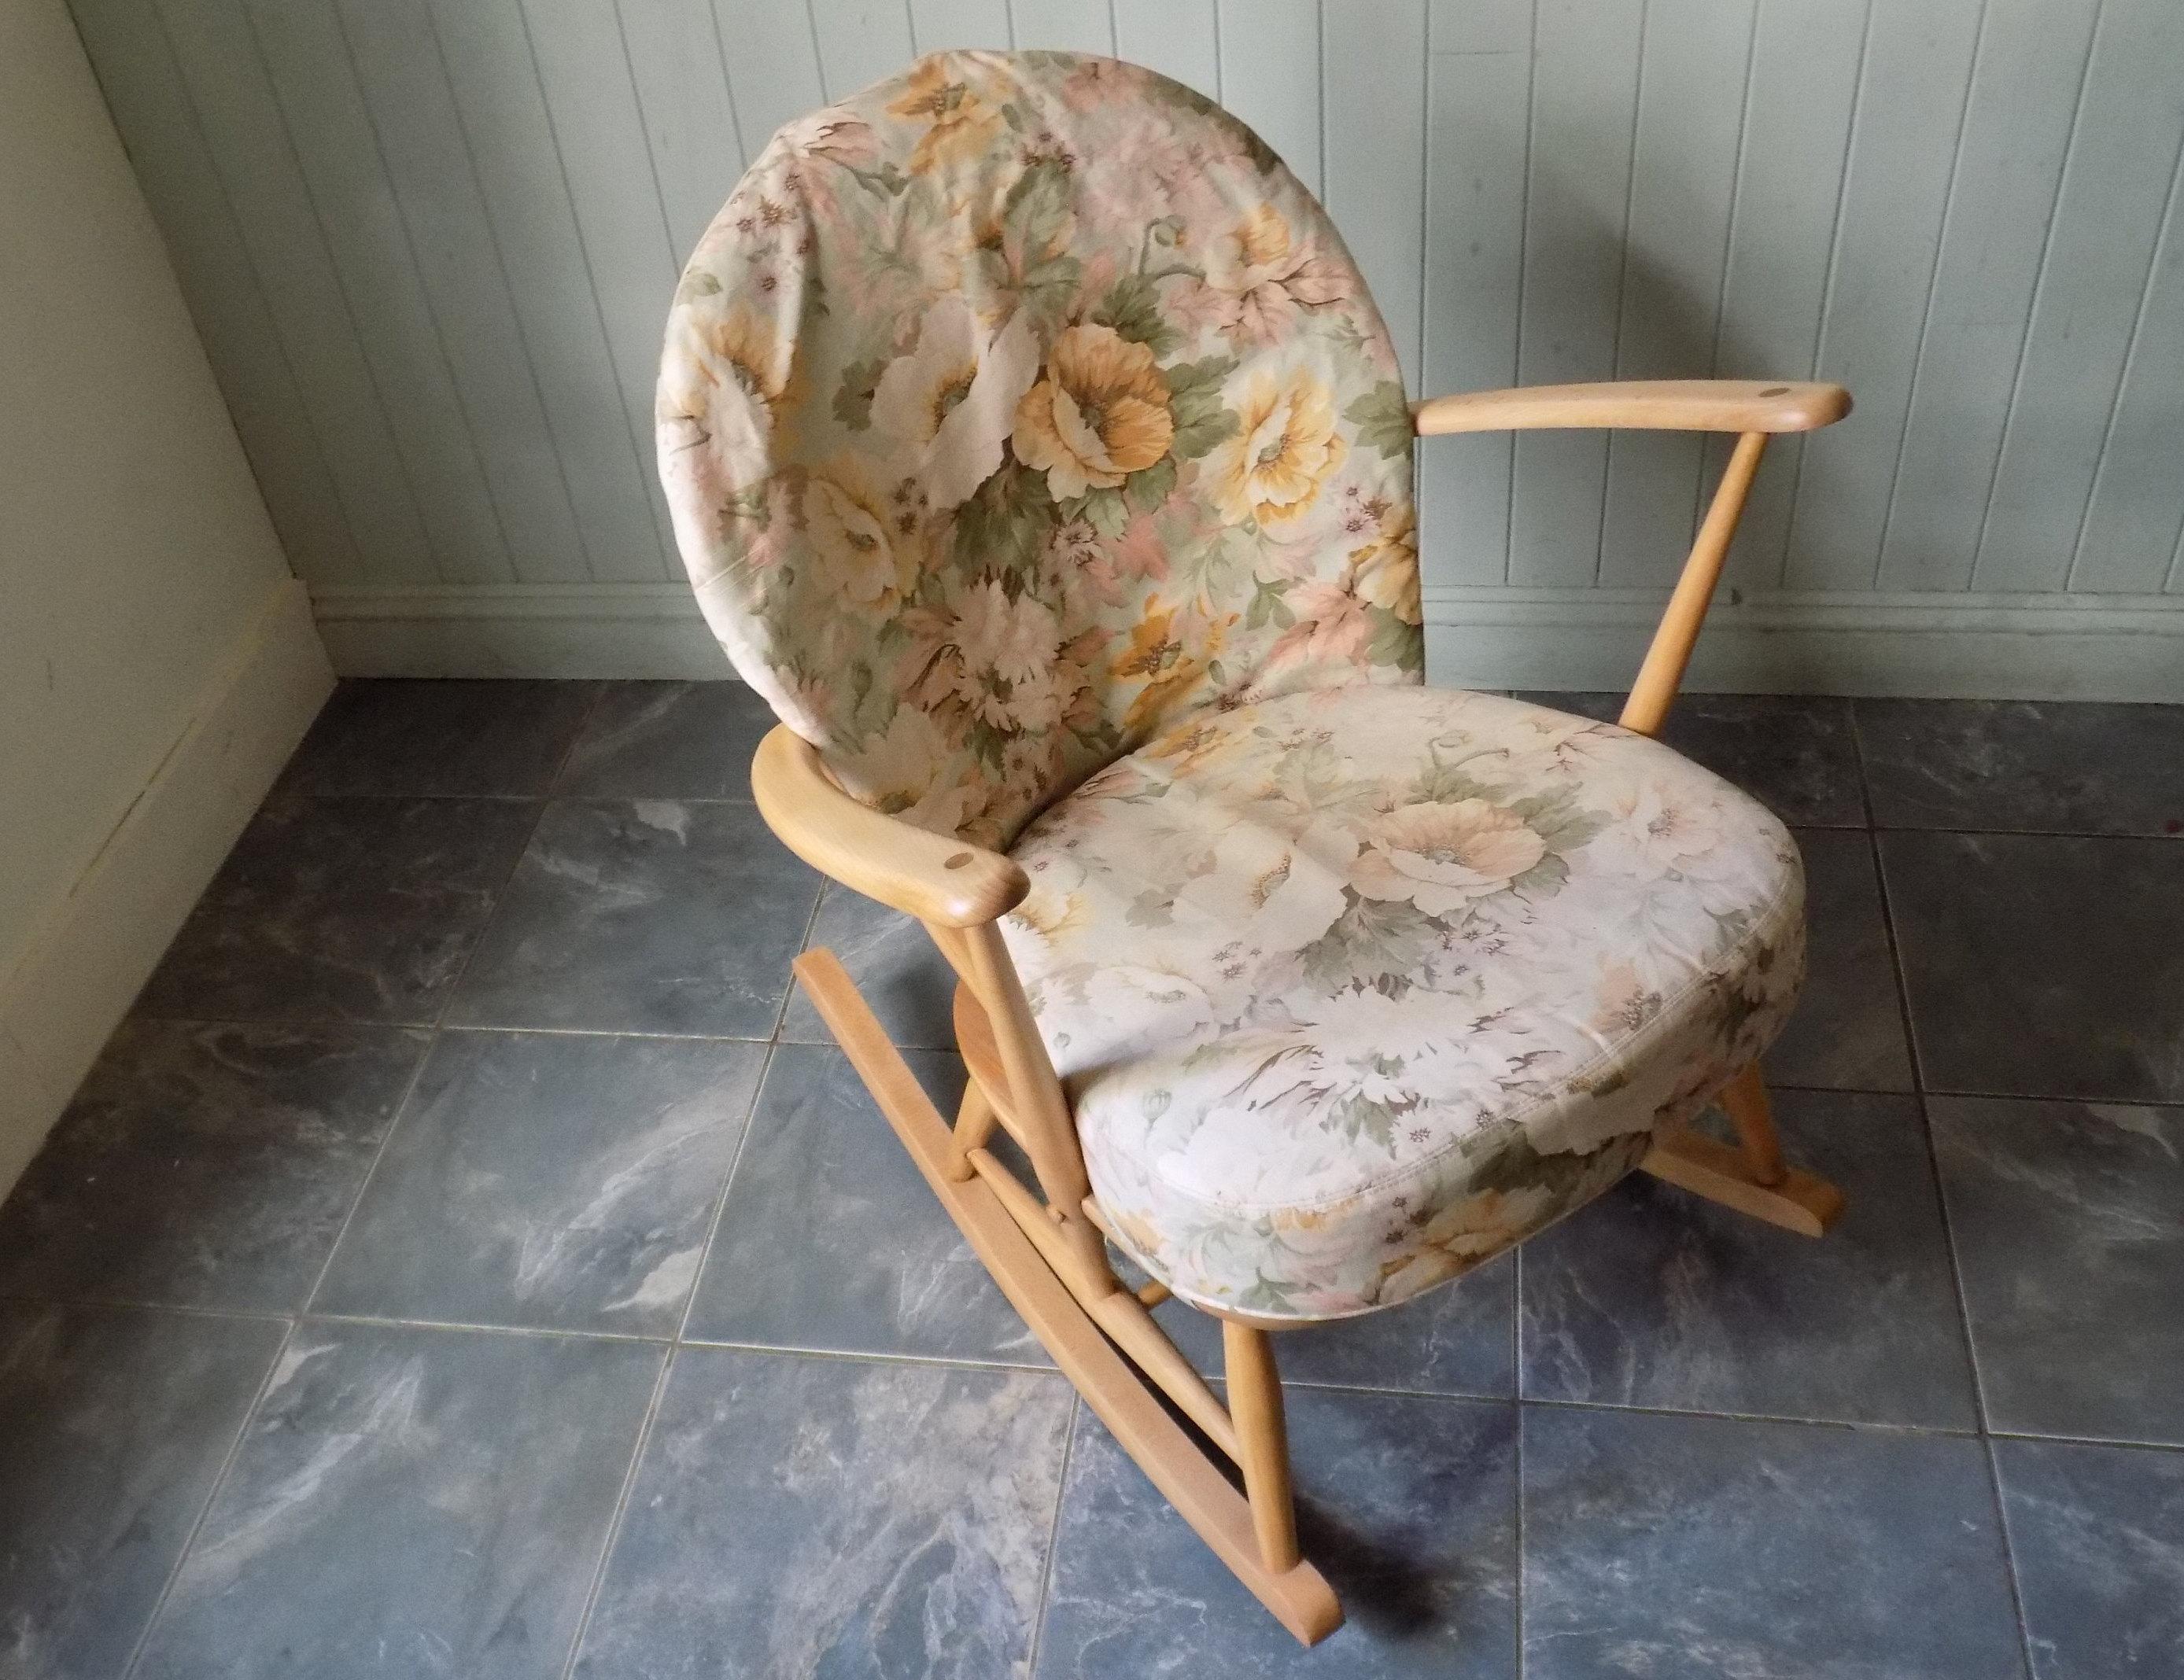 Tremendous 470 Ercol Tub Rocking Chair Vintage 1970S Mid Century Restored Evergreenethics Interior Chair Design Evergreenethicsorg